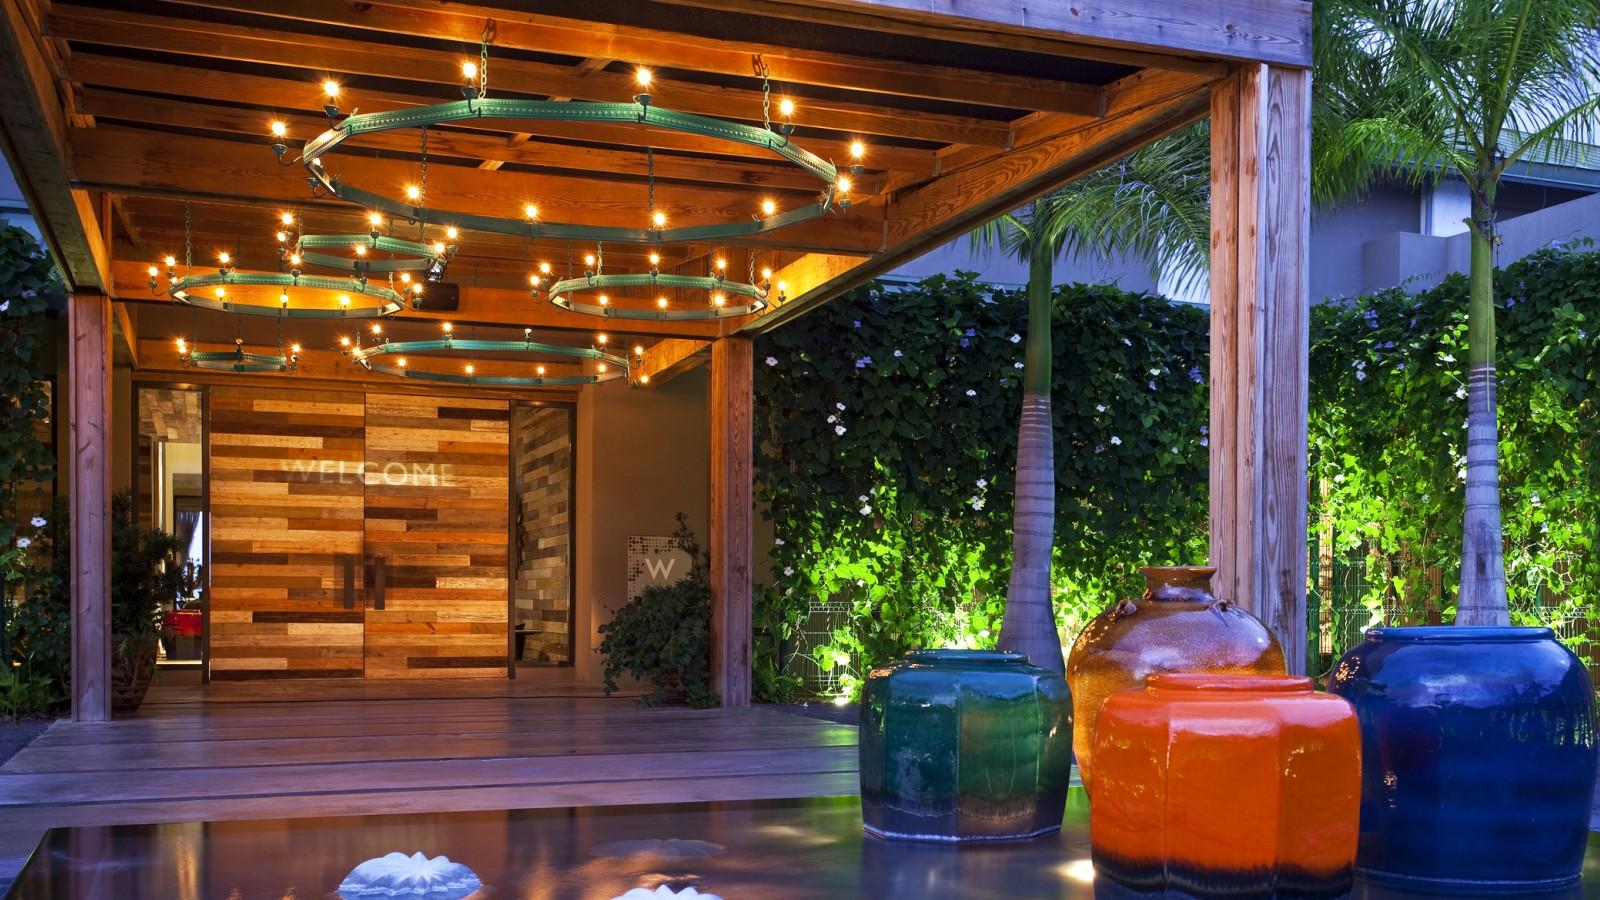 Spa Like Bathroom Ideas Modern Home Entrance Interior Design Ideas